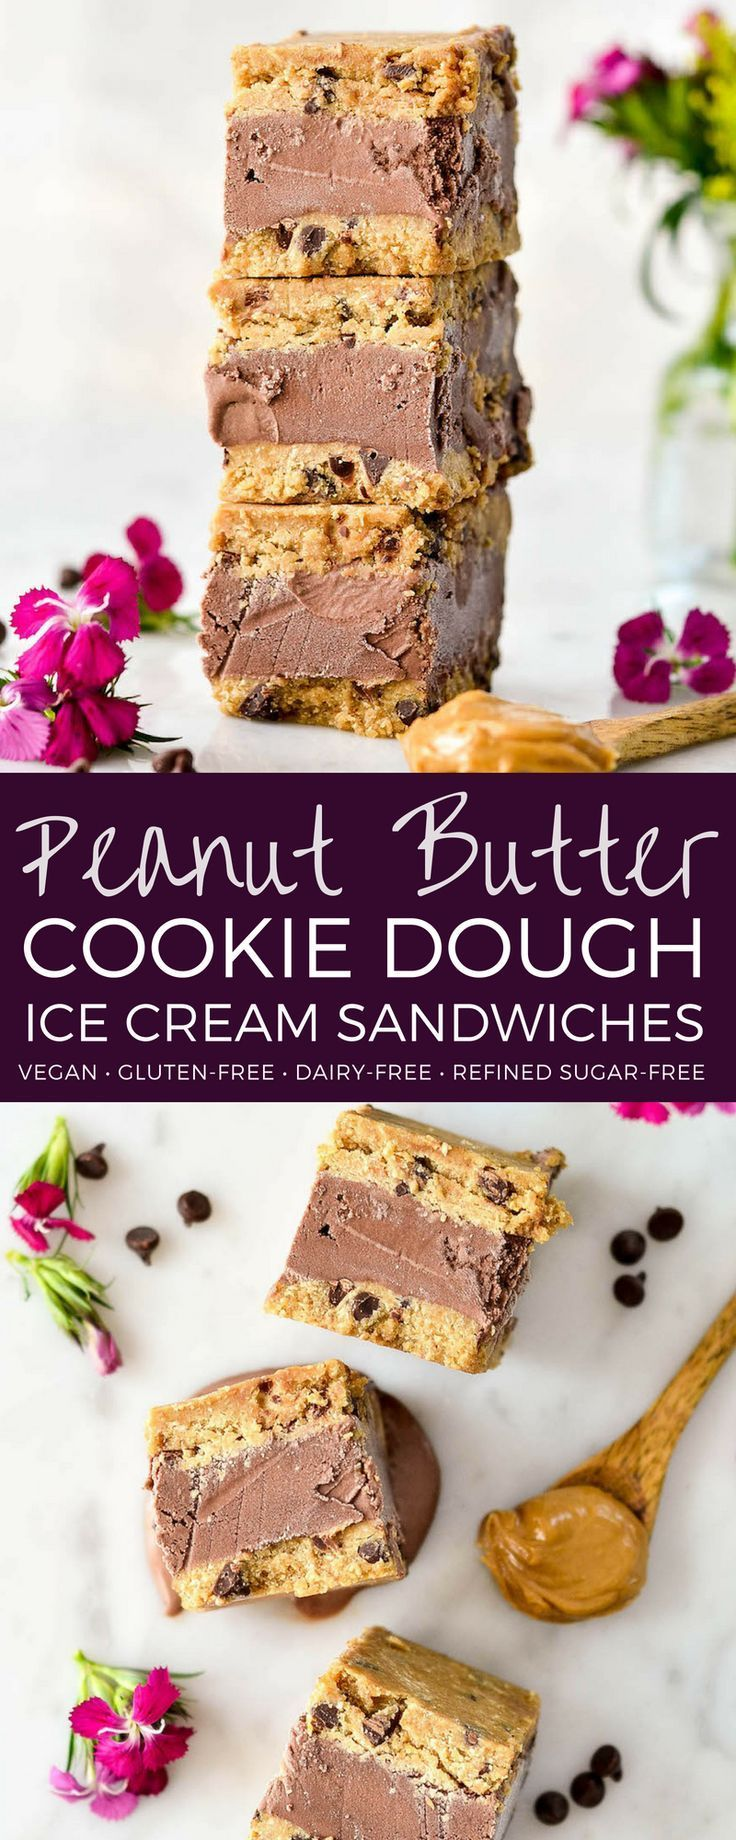 Vegan Peanut Butter Cookie Dough Ice Cream Sandwiches